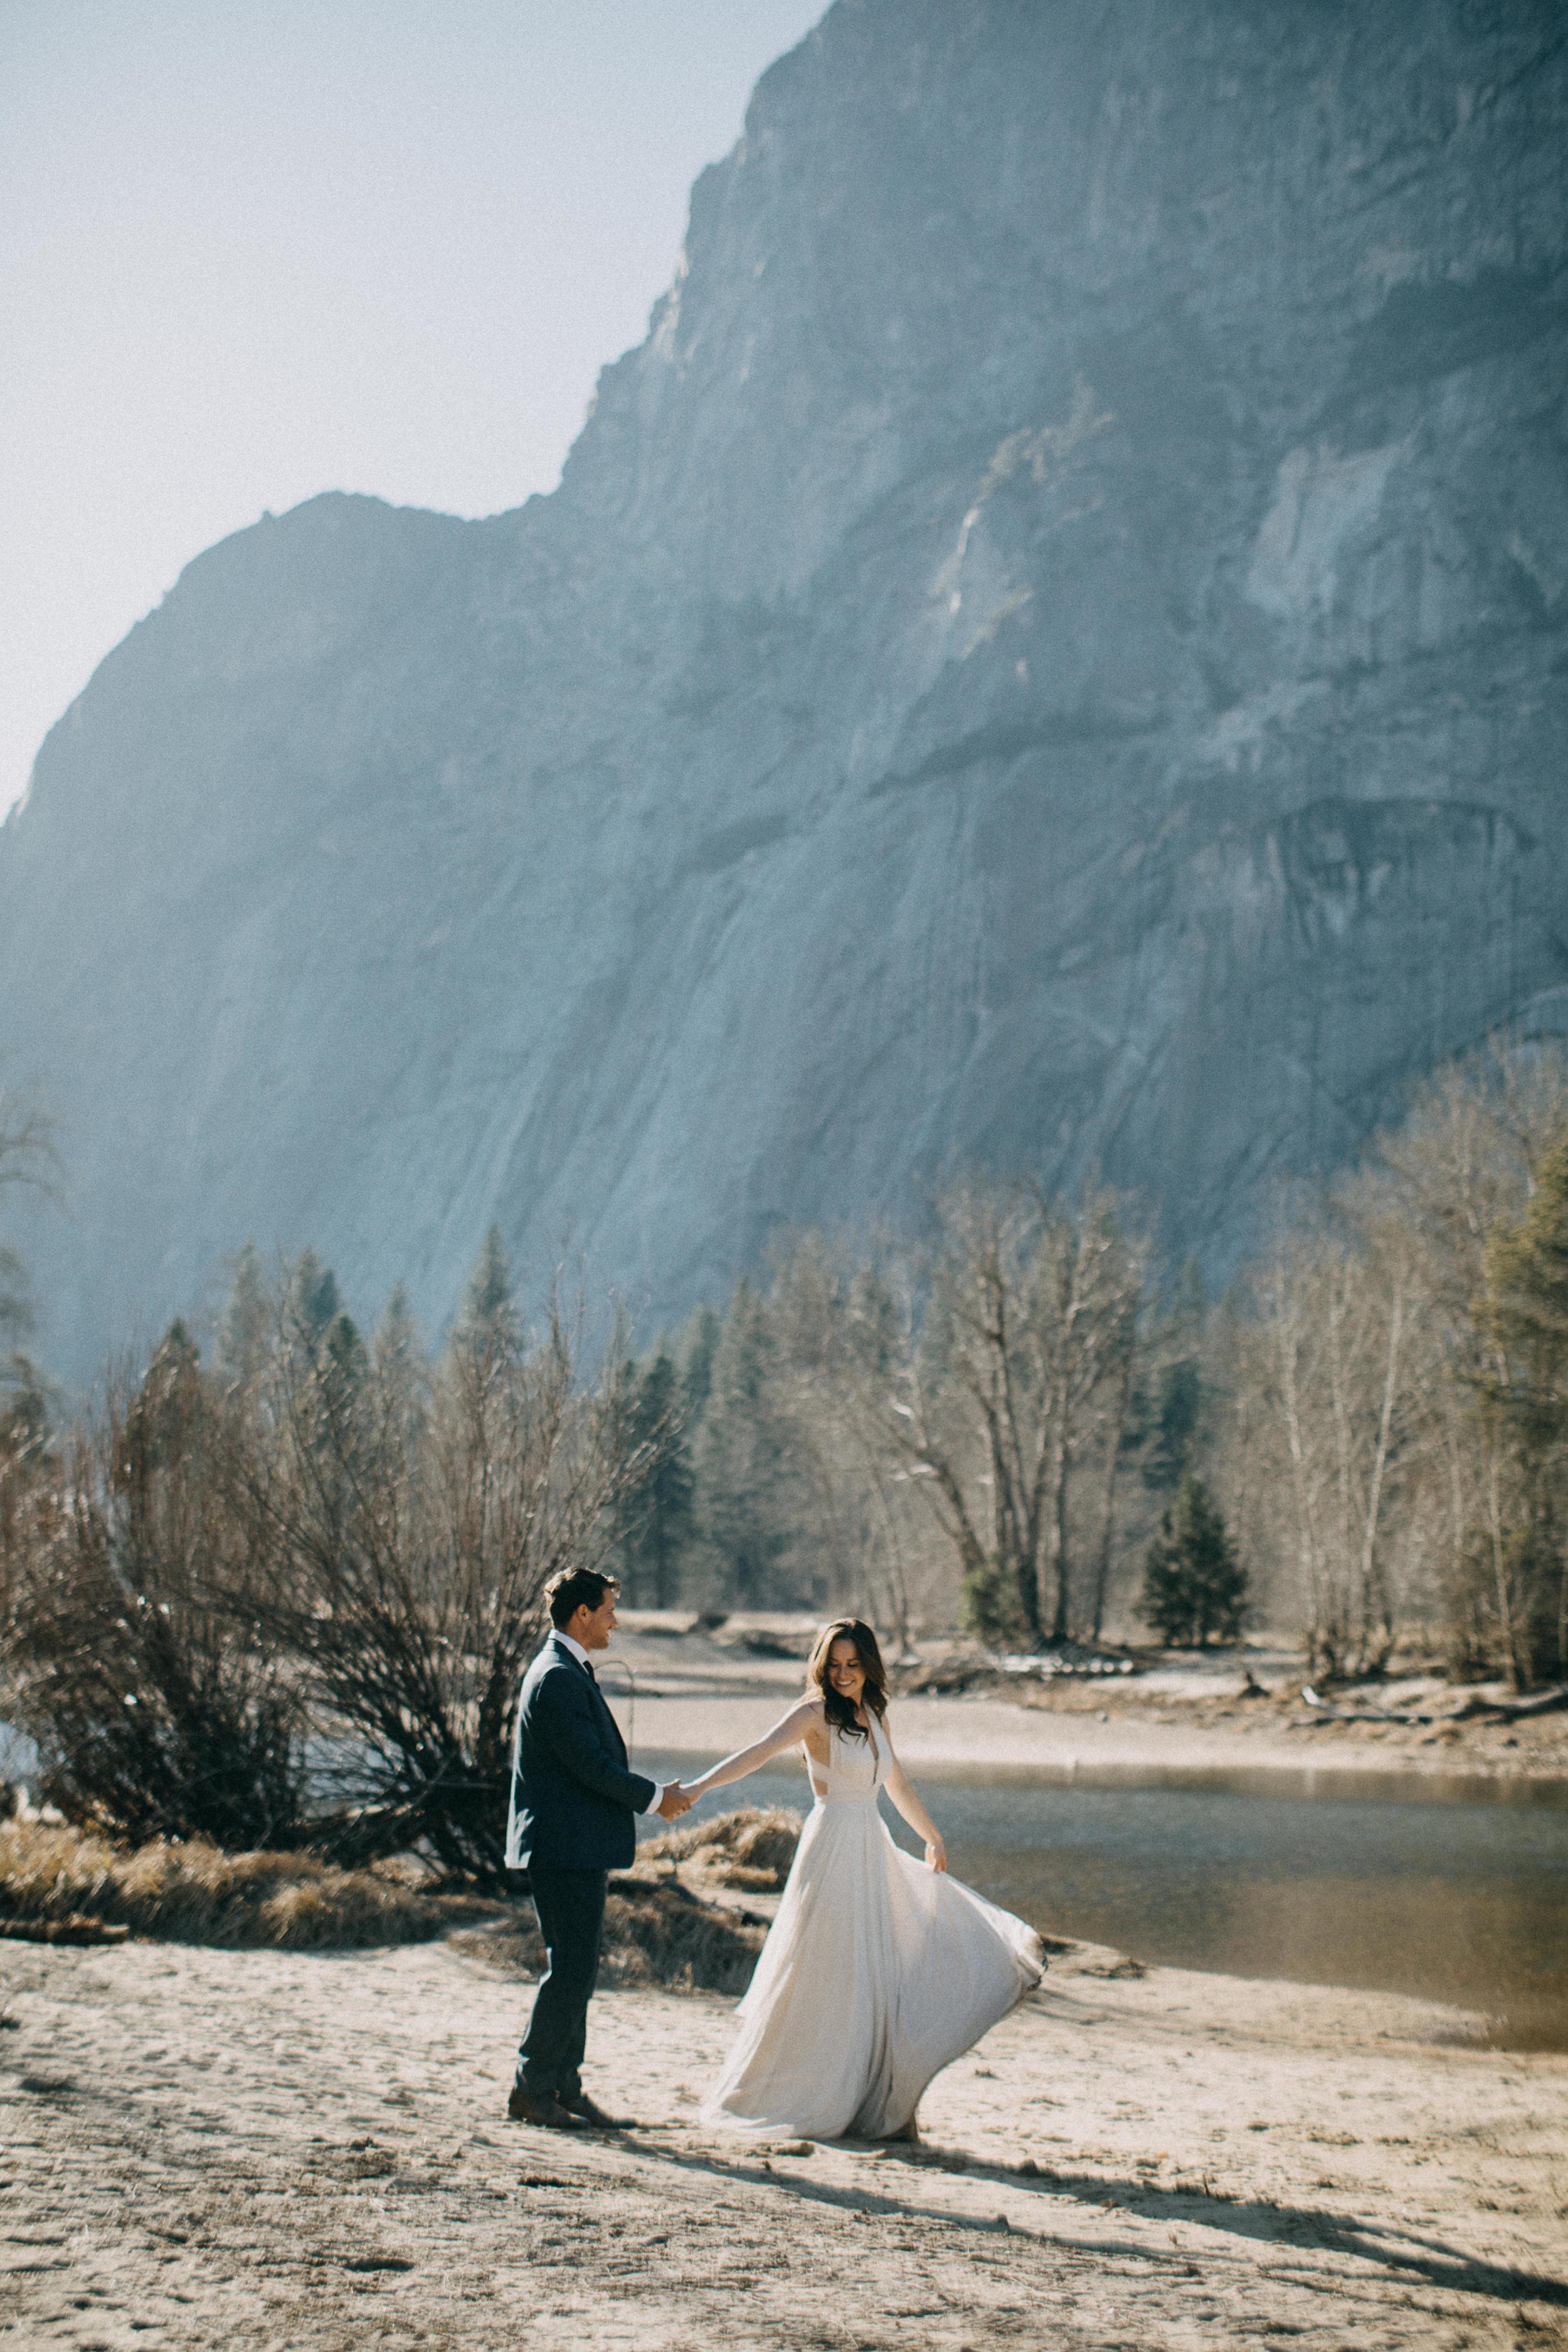 Elopement in Yosemite National Park